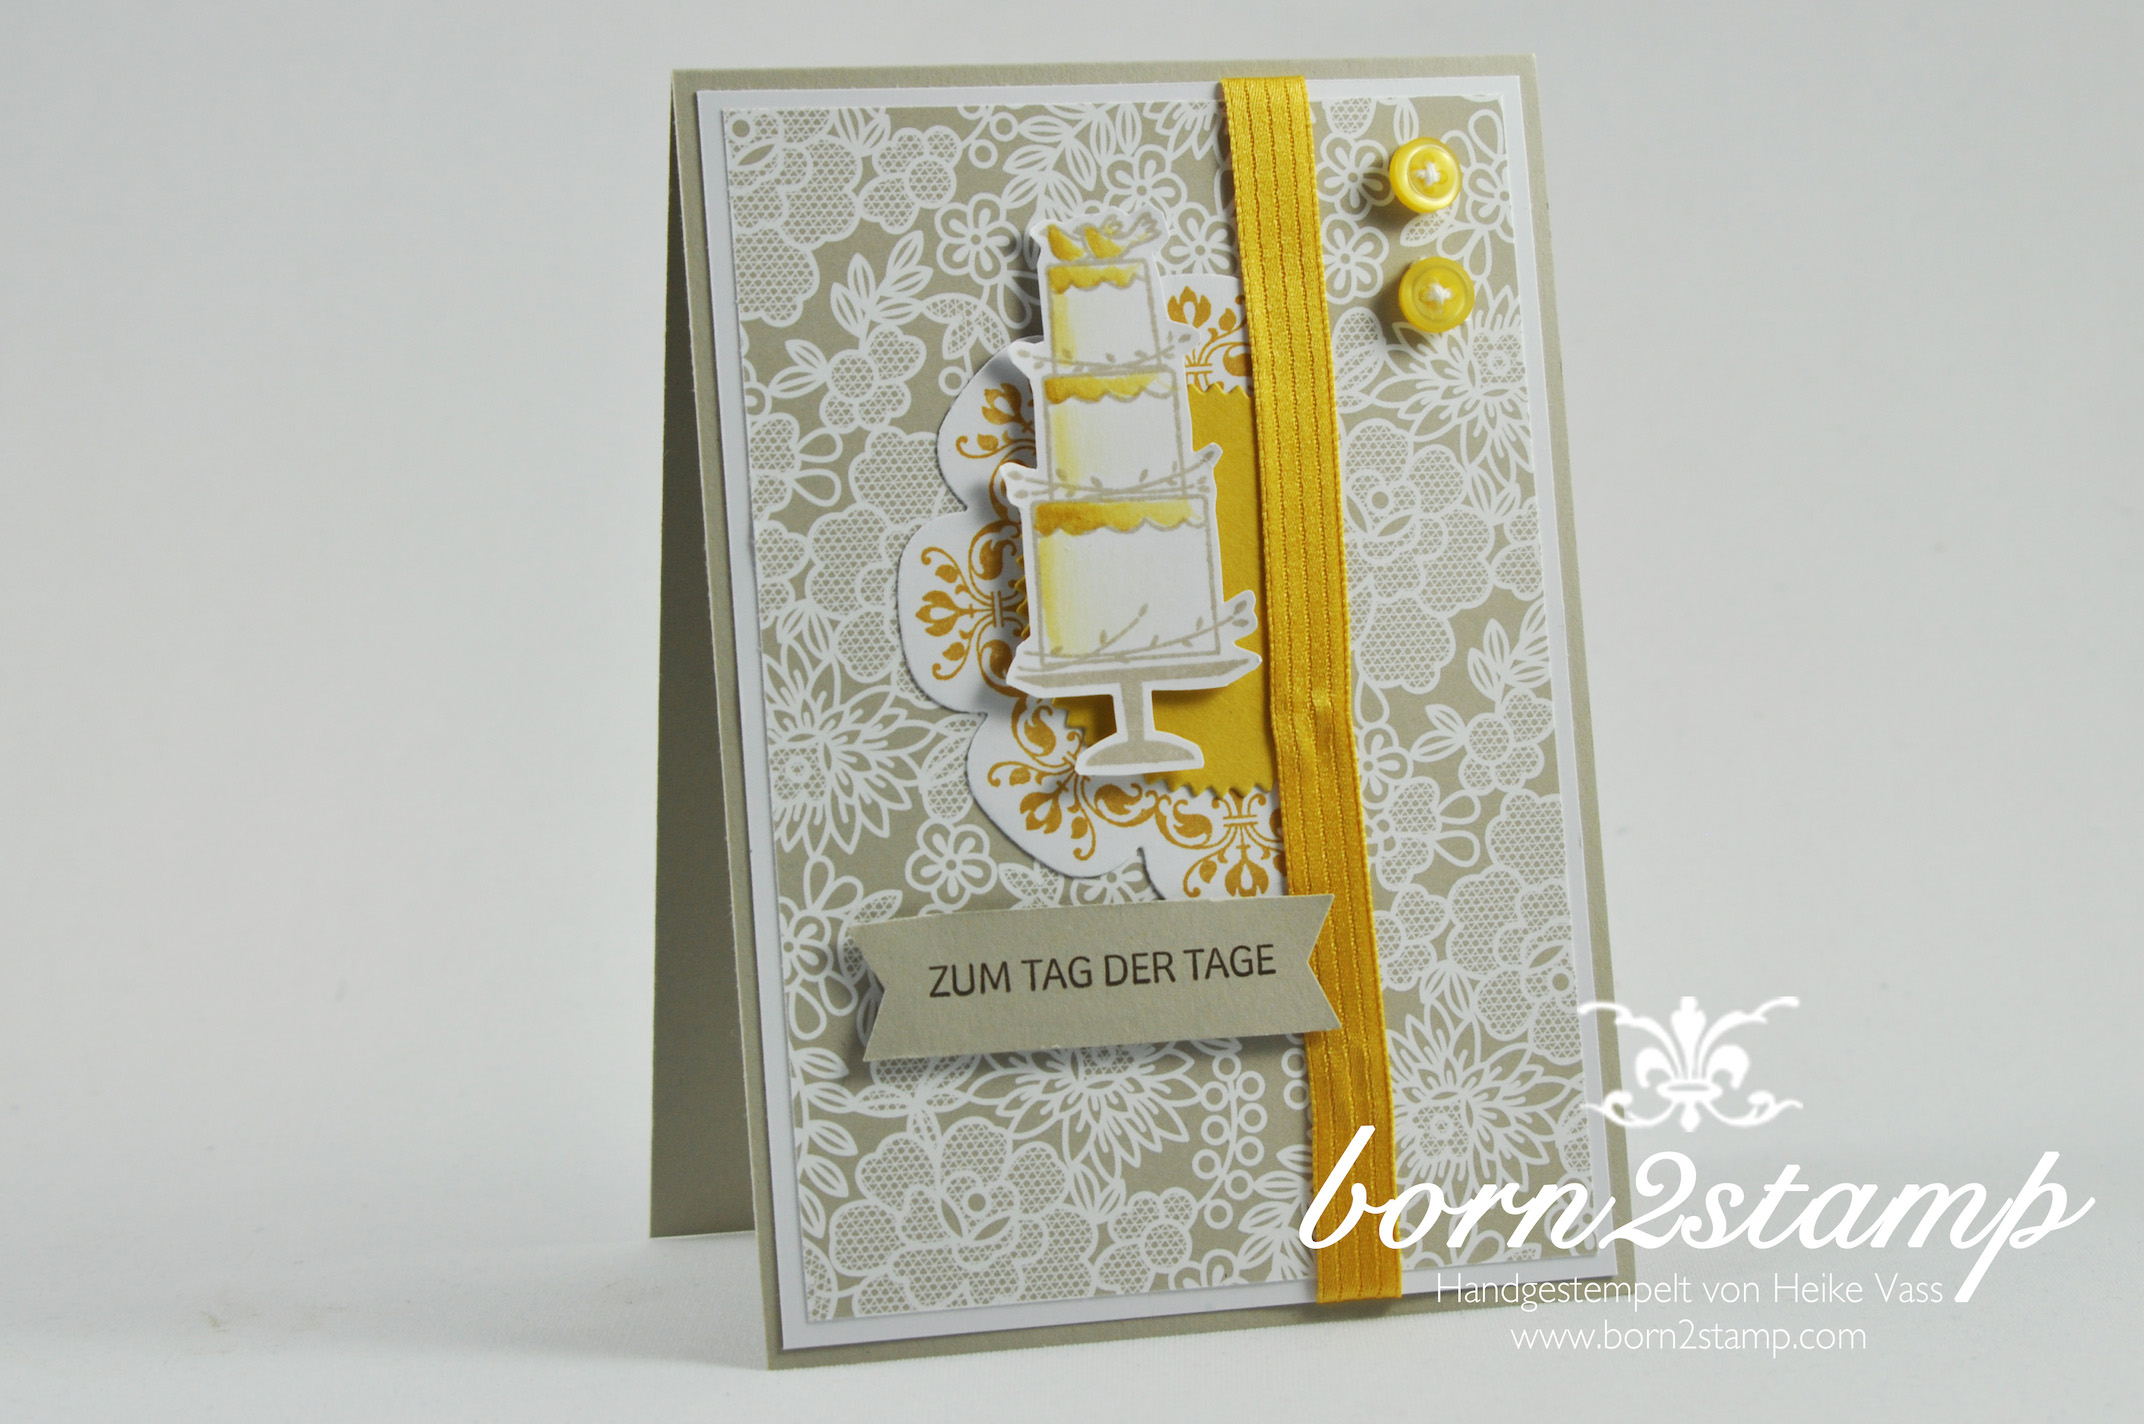 STAMPIN' UP! born2stamp Hochzeitskarte – wedding – Daydream Medallion – Perfekter Tag – Starburst Framelits – Floral Frames Framelits – DSP Trau Dich